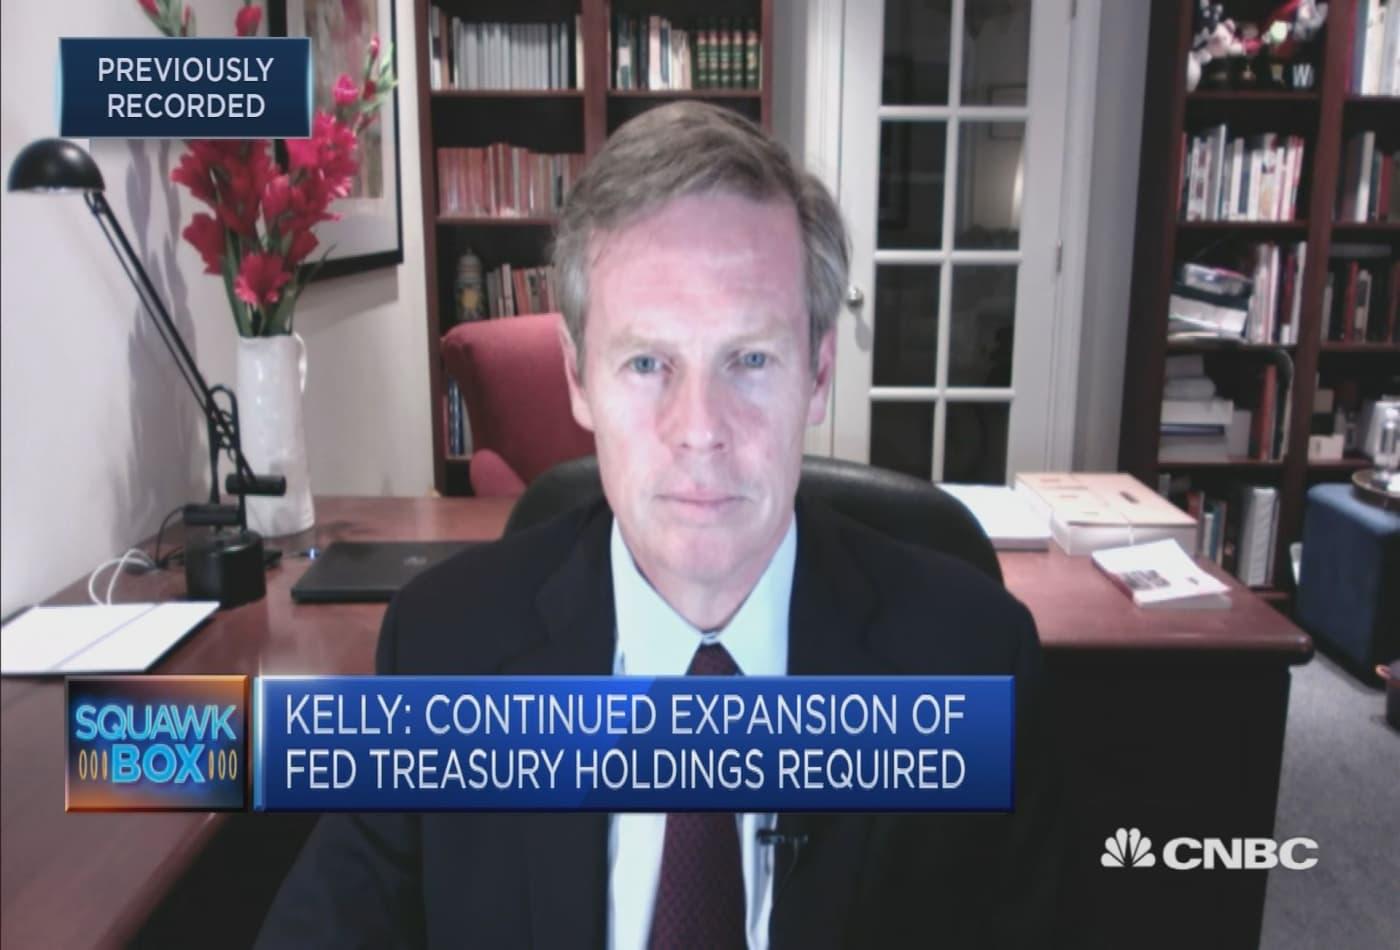 U.S. real yields are 'unreasonably low', says JPMorgan strategist